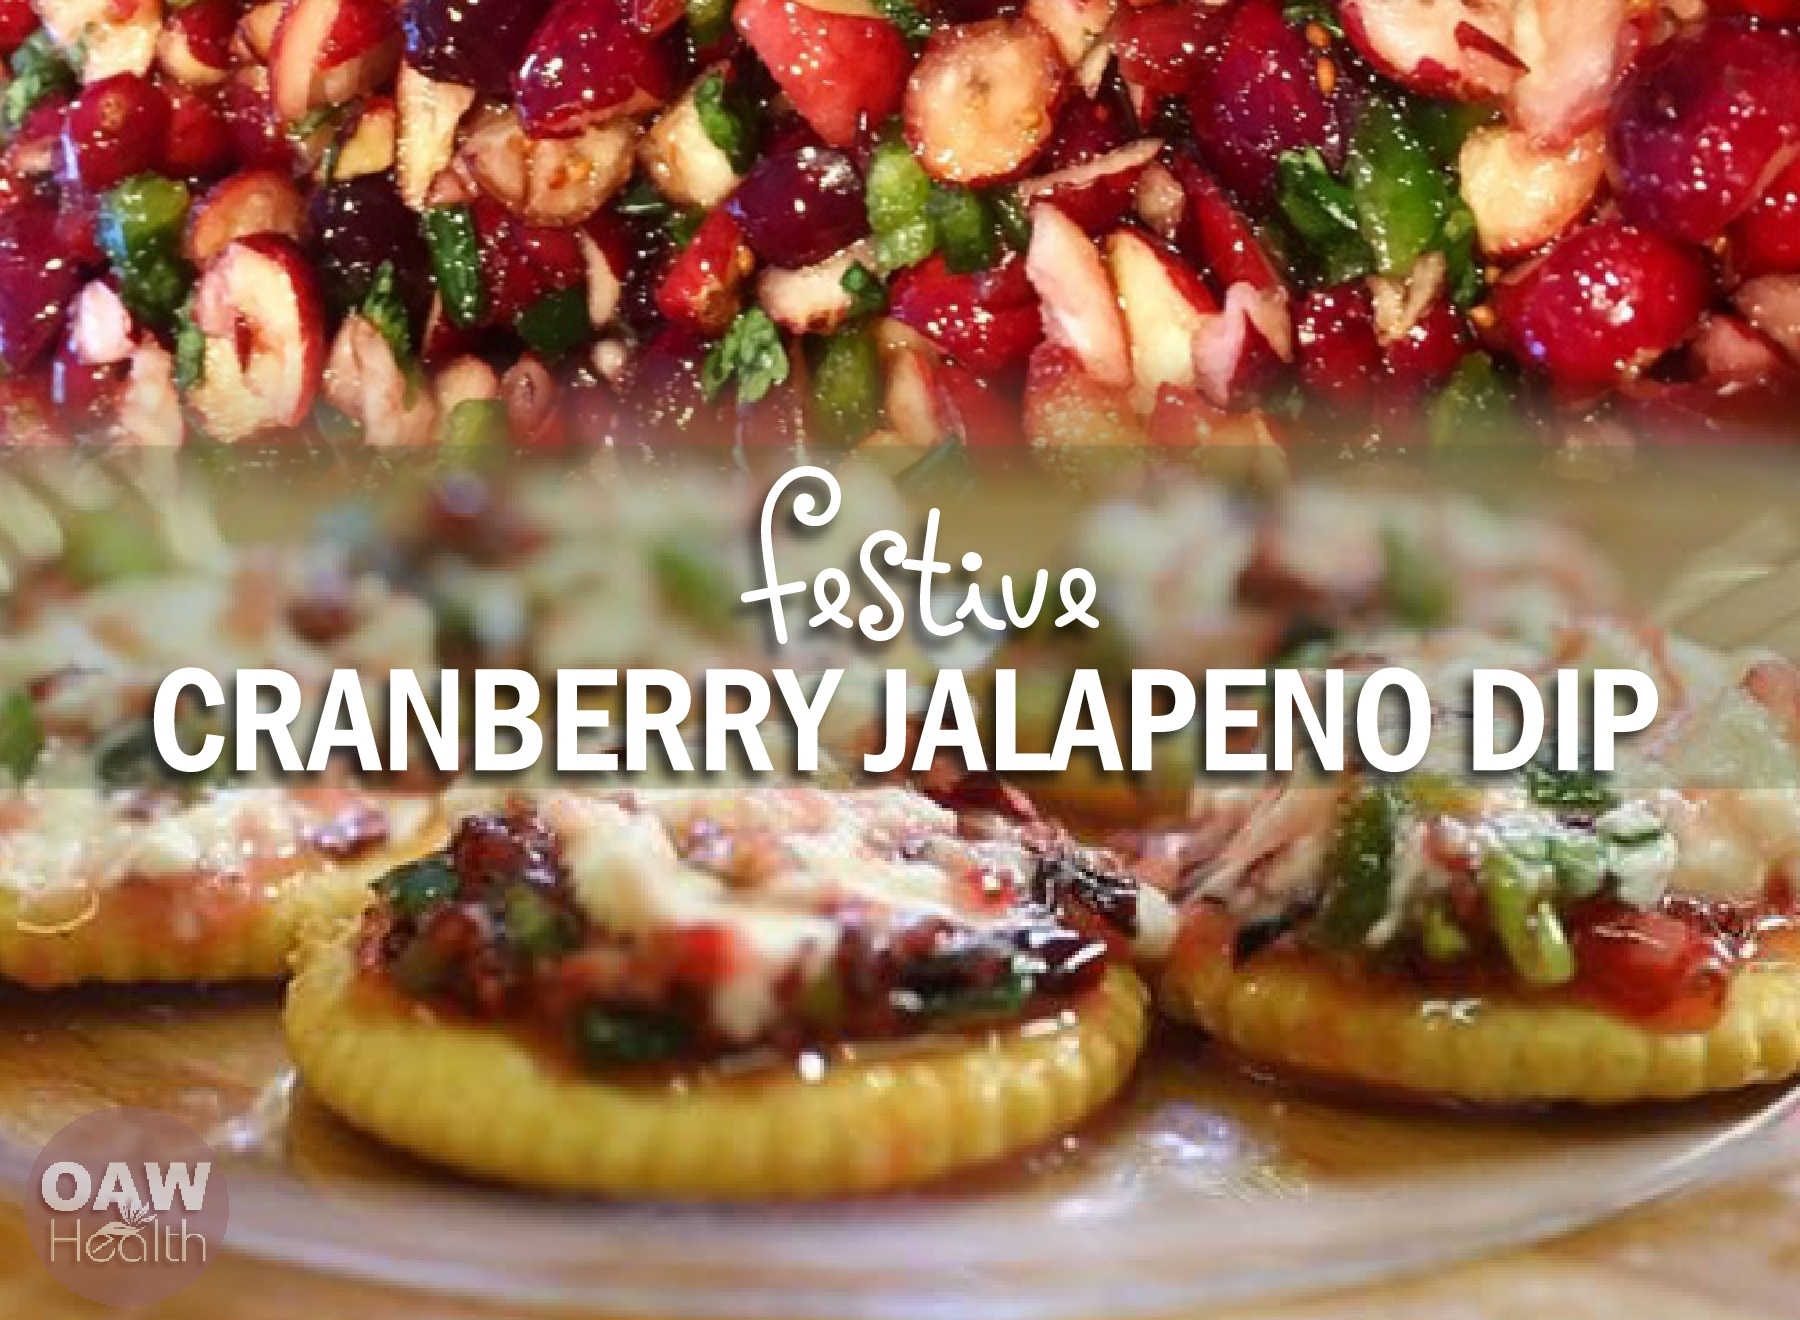 Festive Cranberry Jalapeno Dip